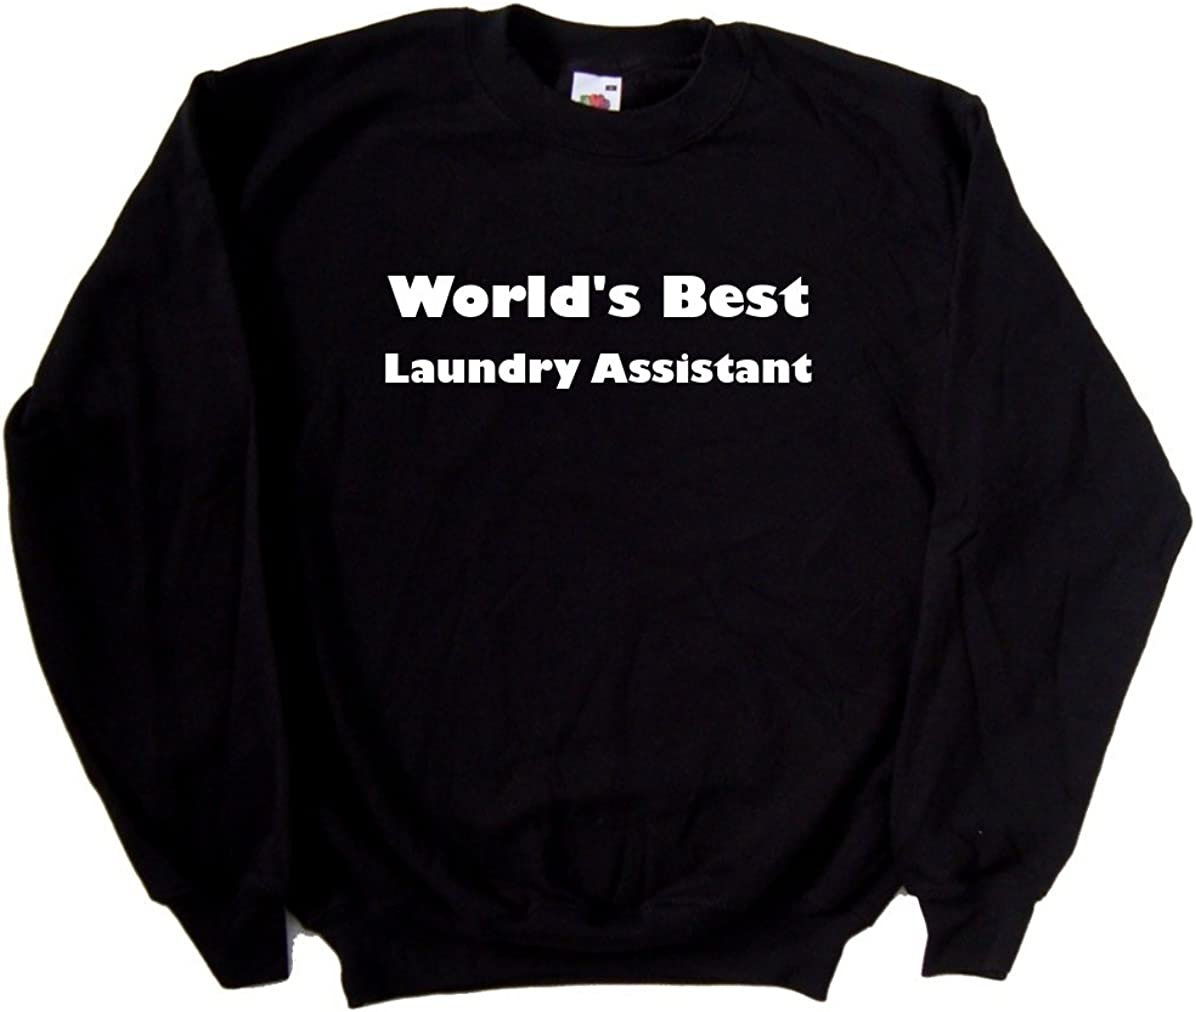 Worlds Best Laundry Assistant Black Sweatshirt